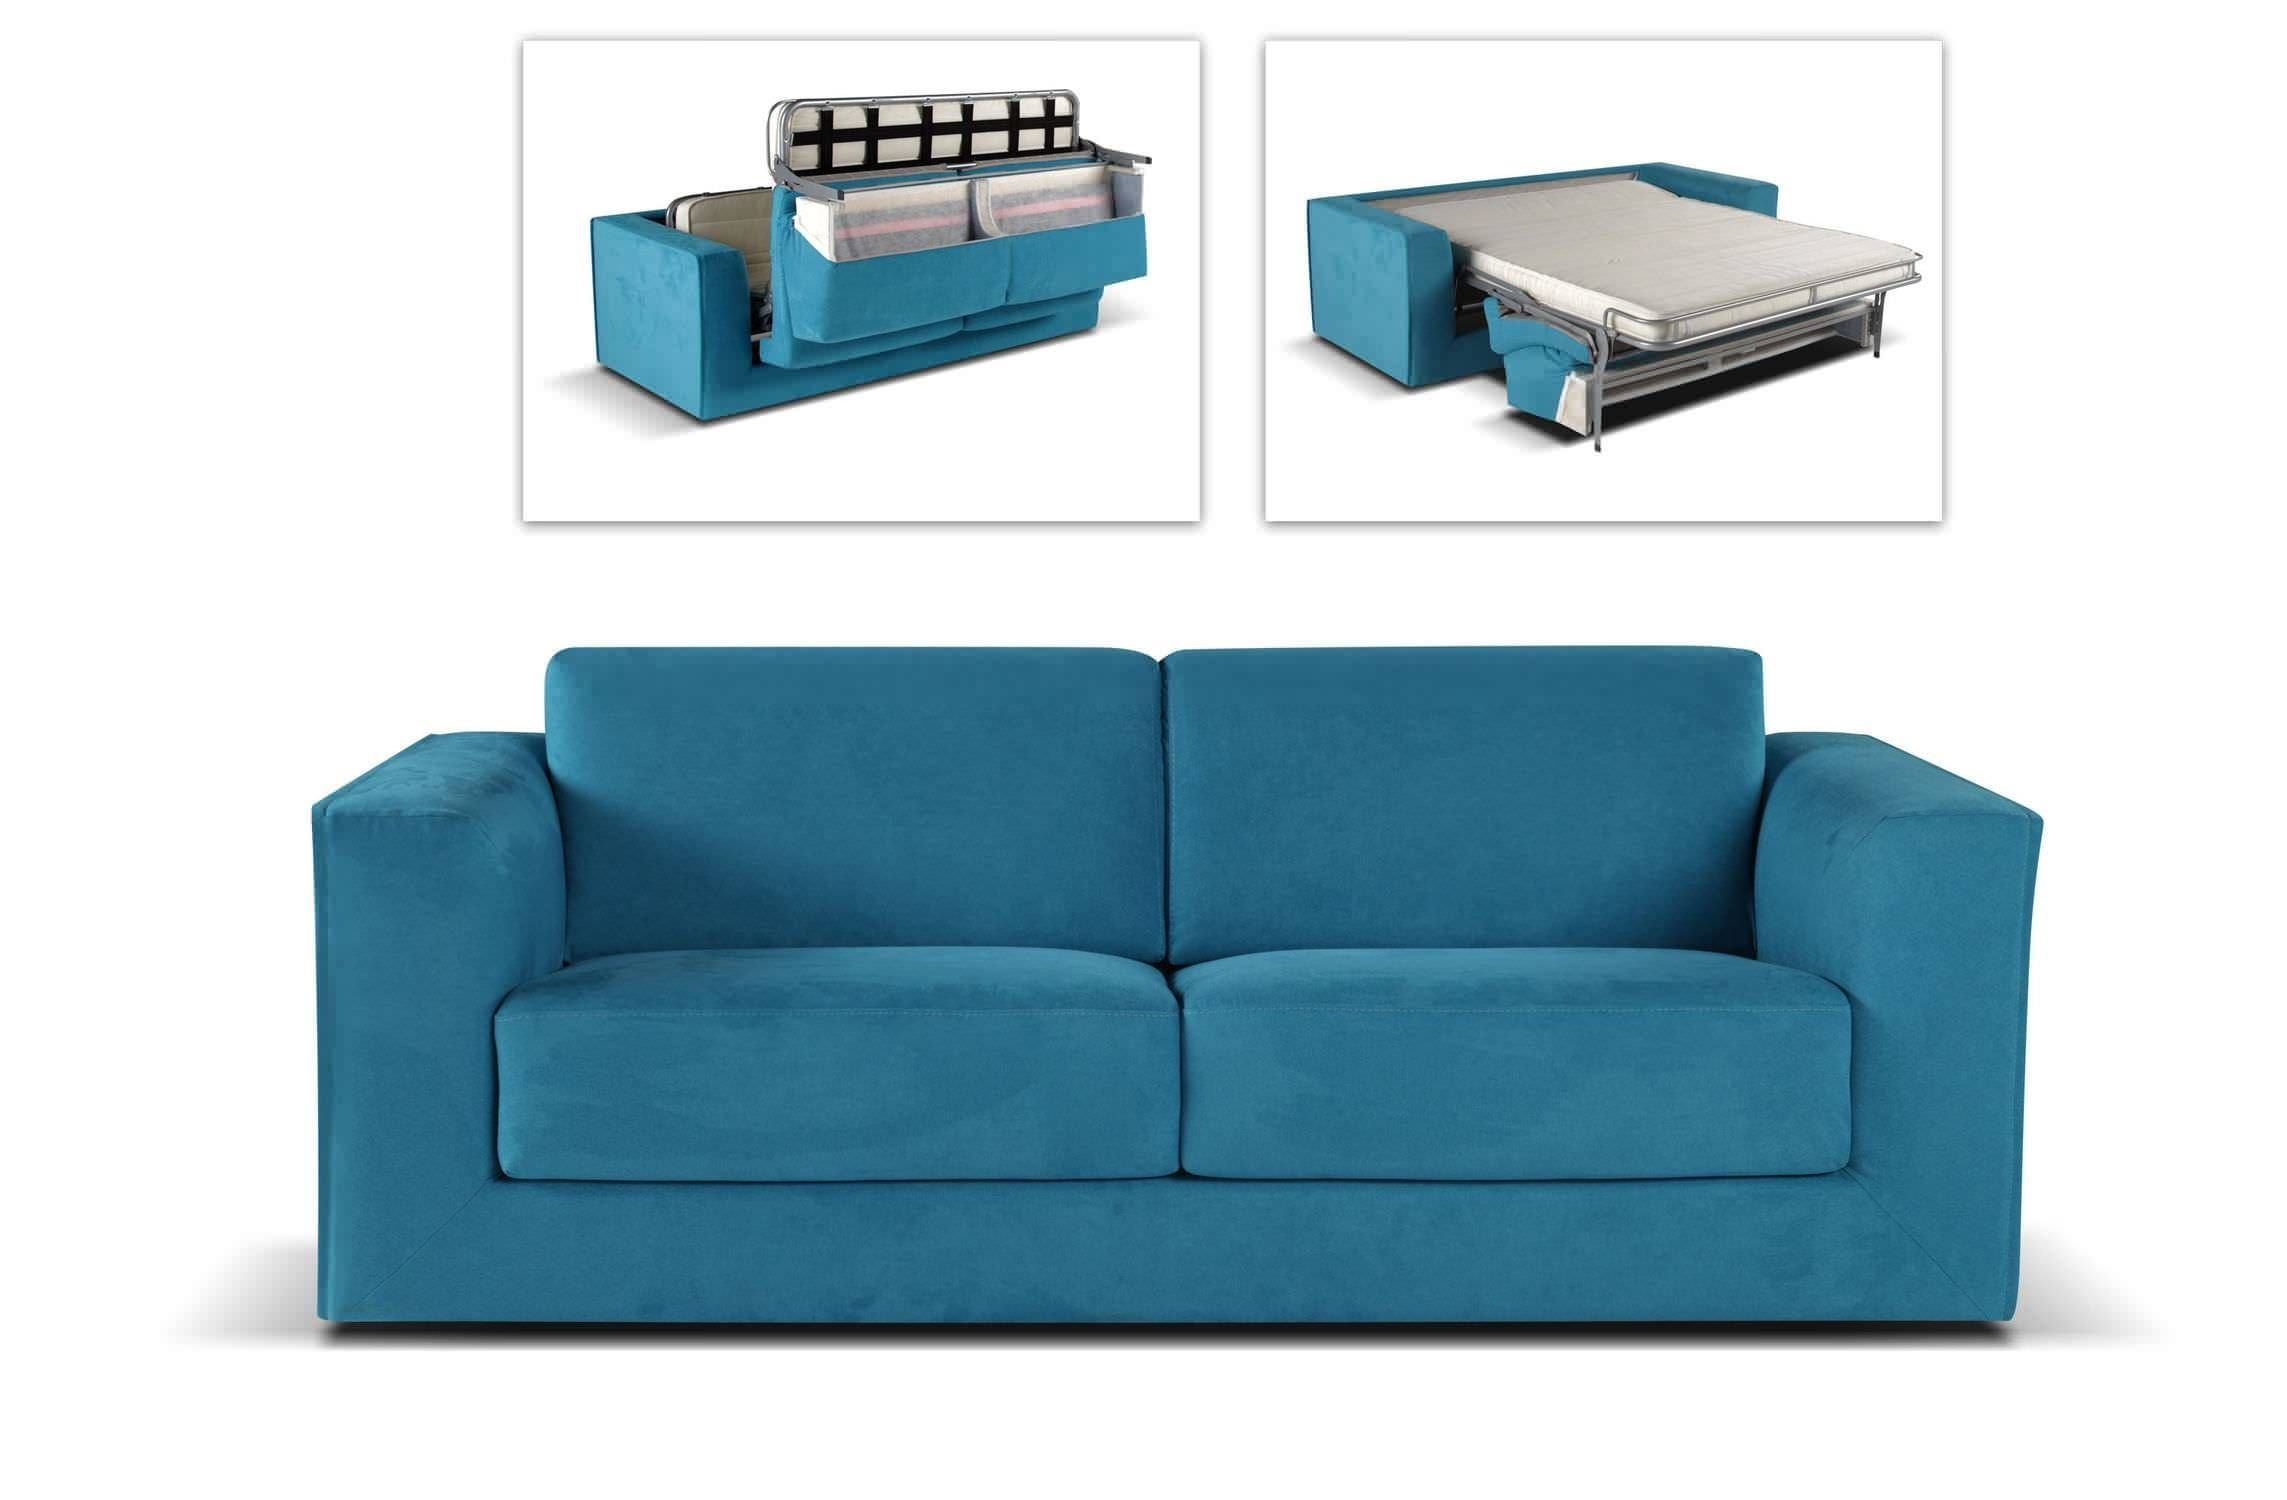 Ottoman That Turns Into A Chair Bett Matratze Sofa Bestes